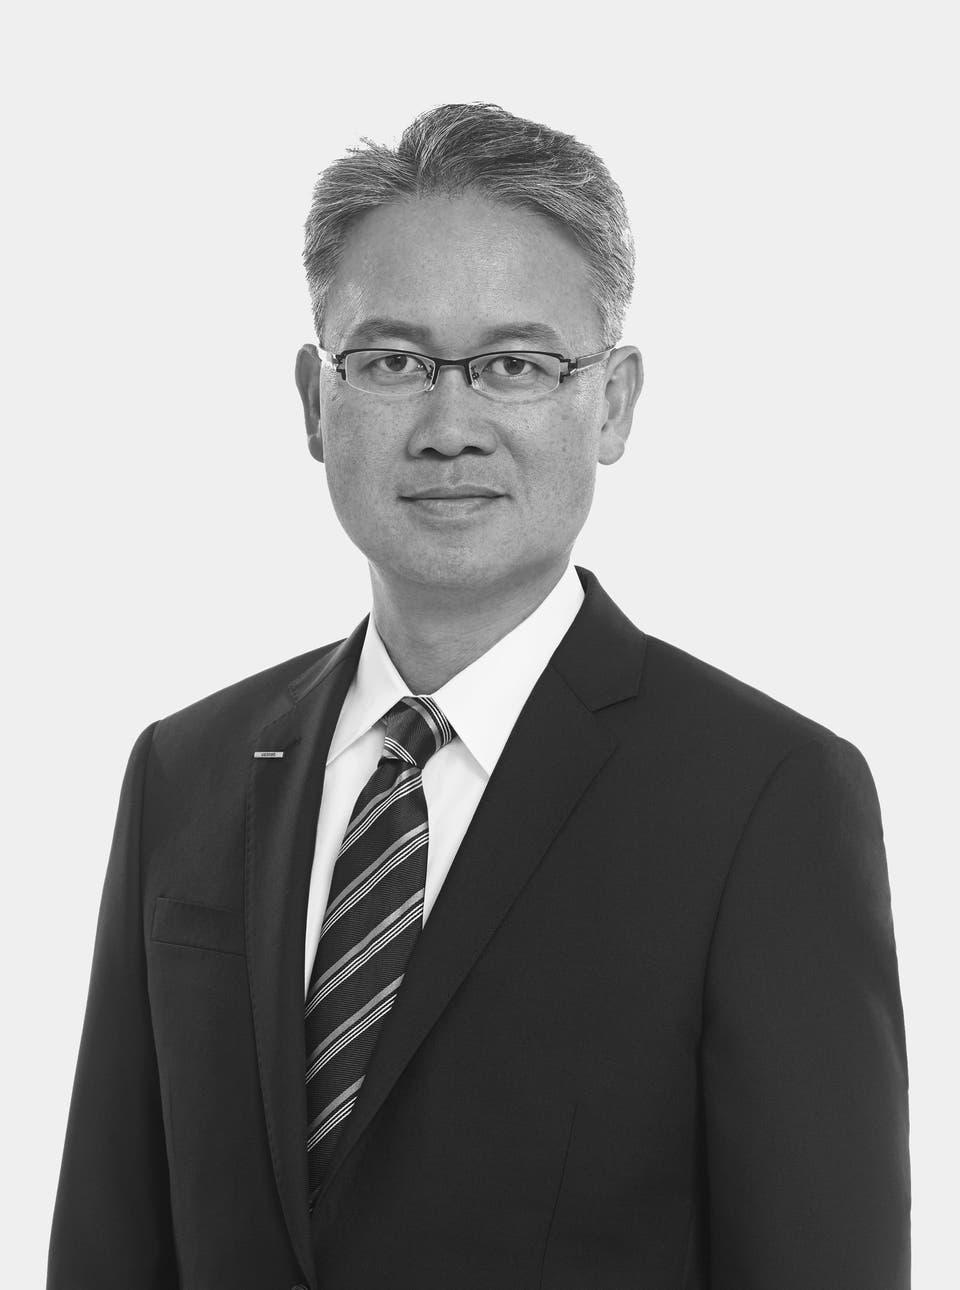 Yushin Soga,  Director and Chief Financial Officer, Dentsu Group Inc.